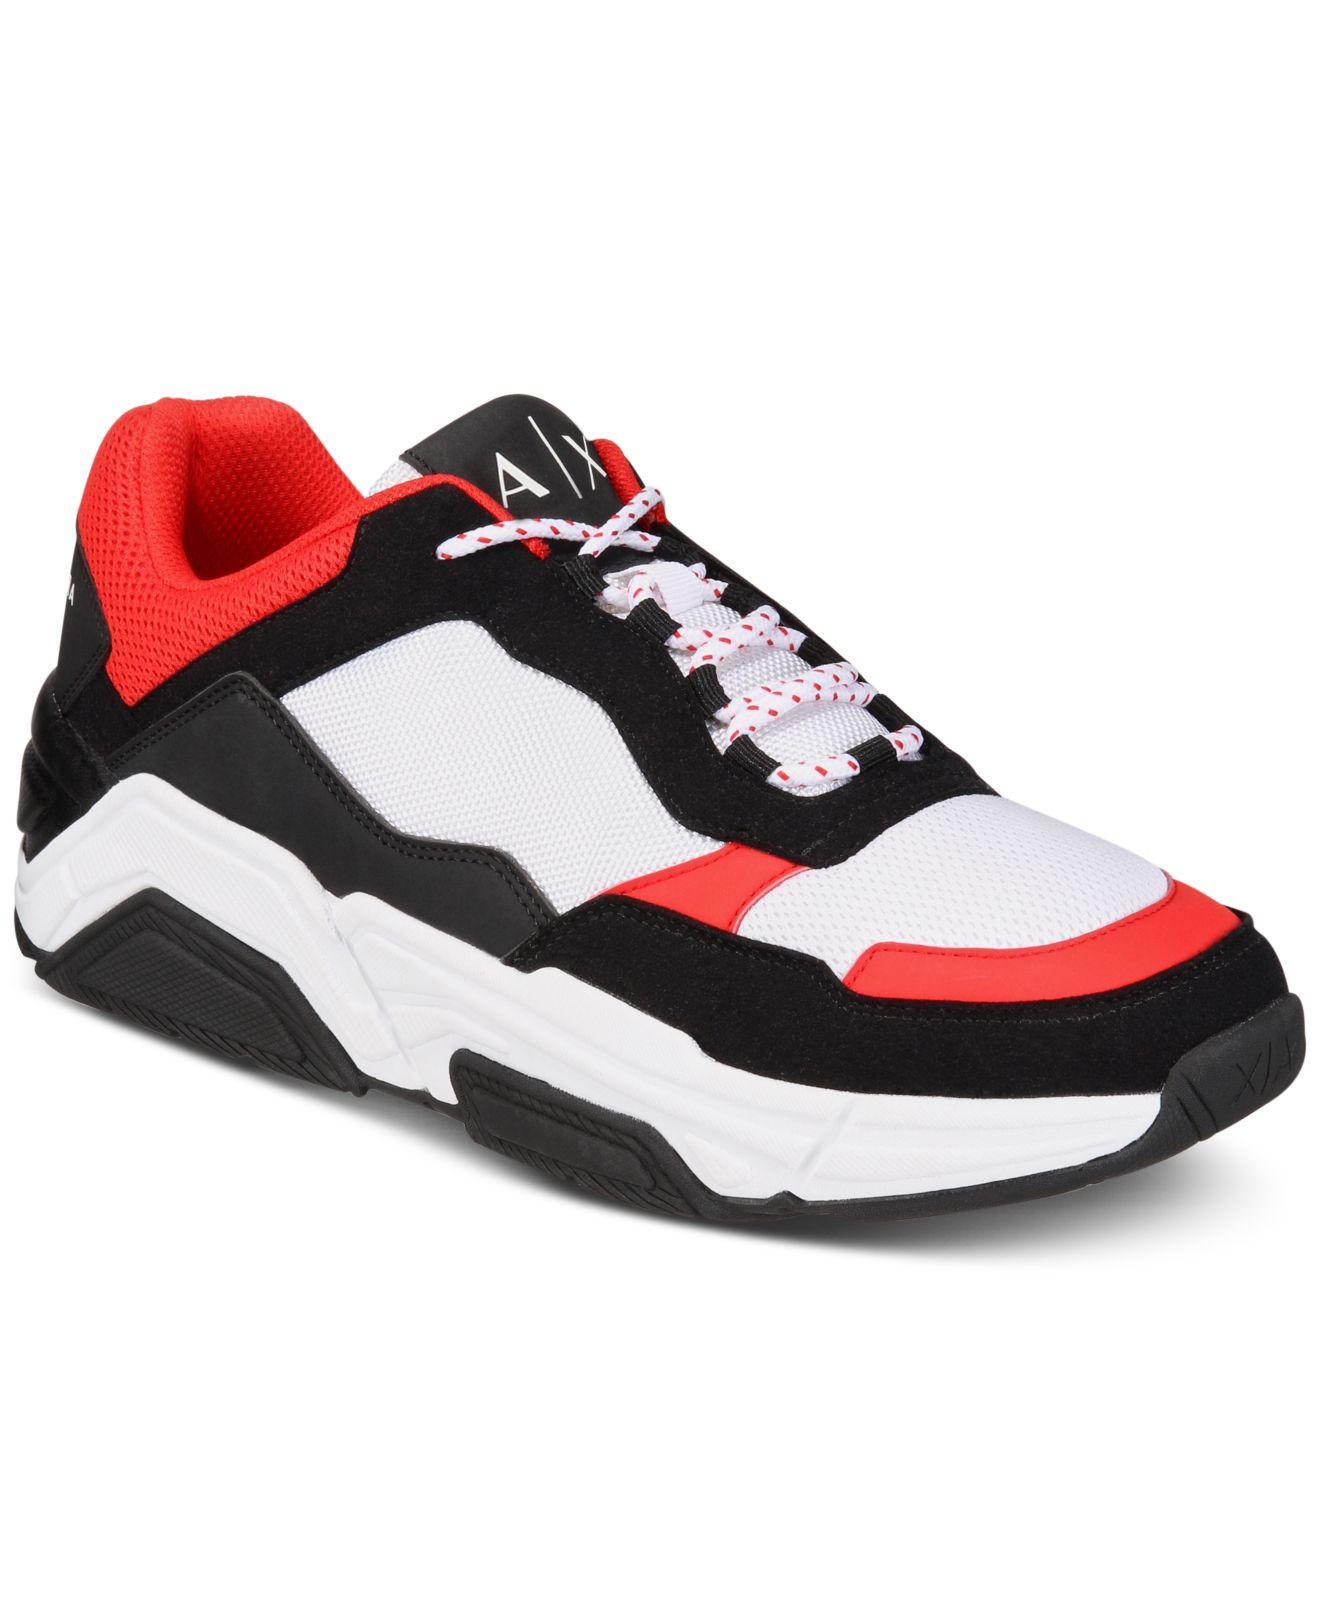 Armani Exchange Dad Sneakers for Men - Lyst